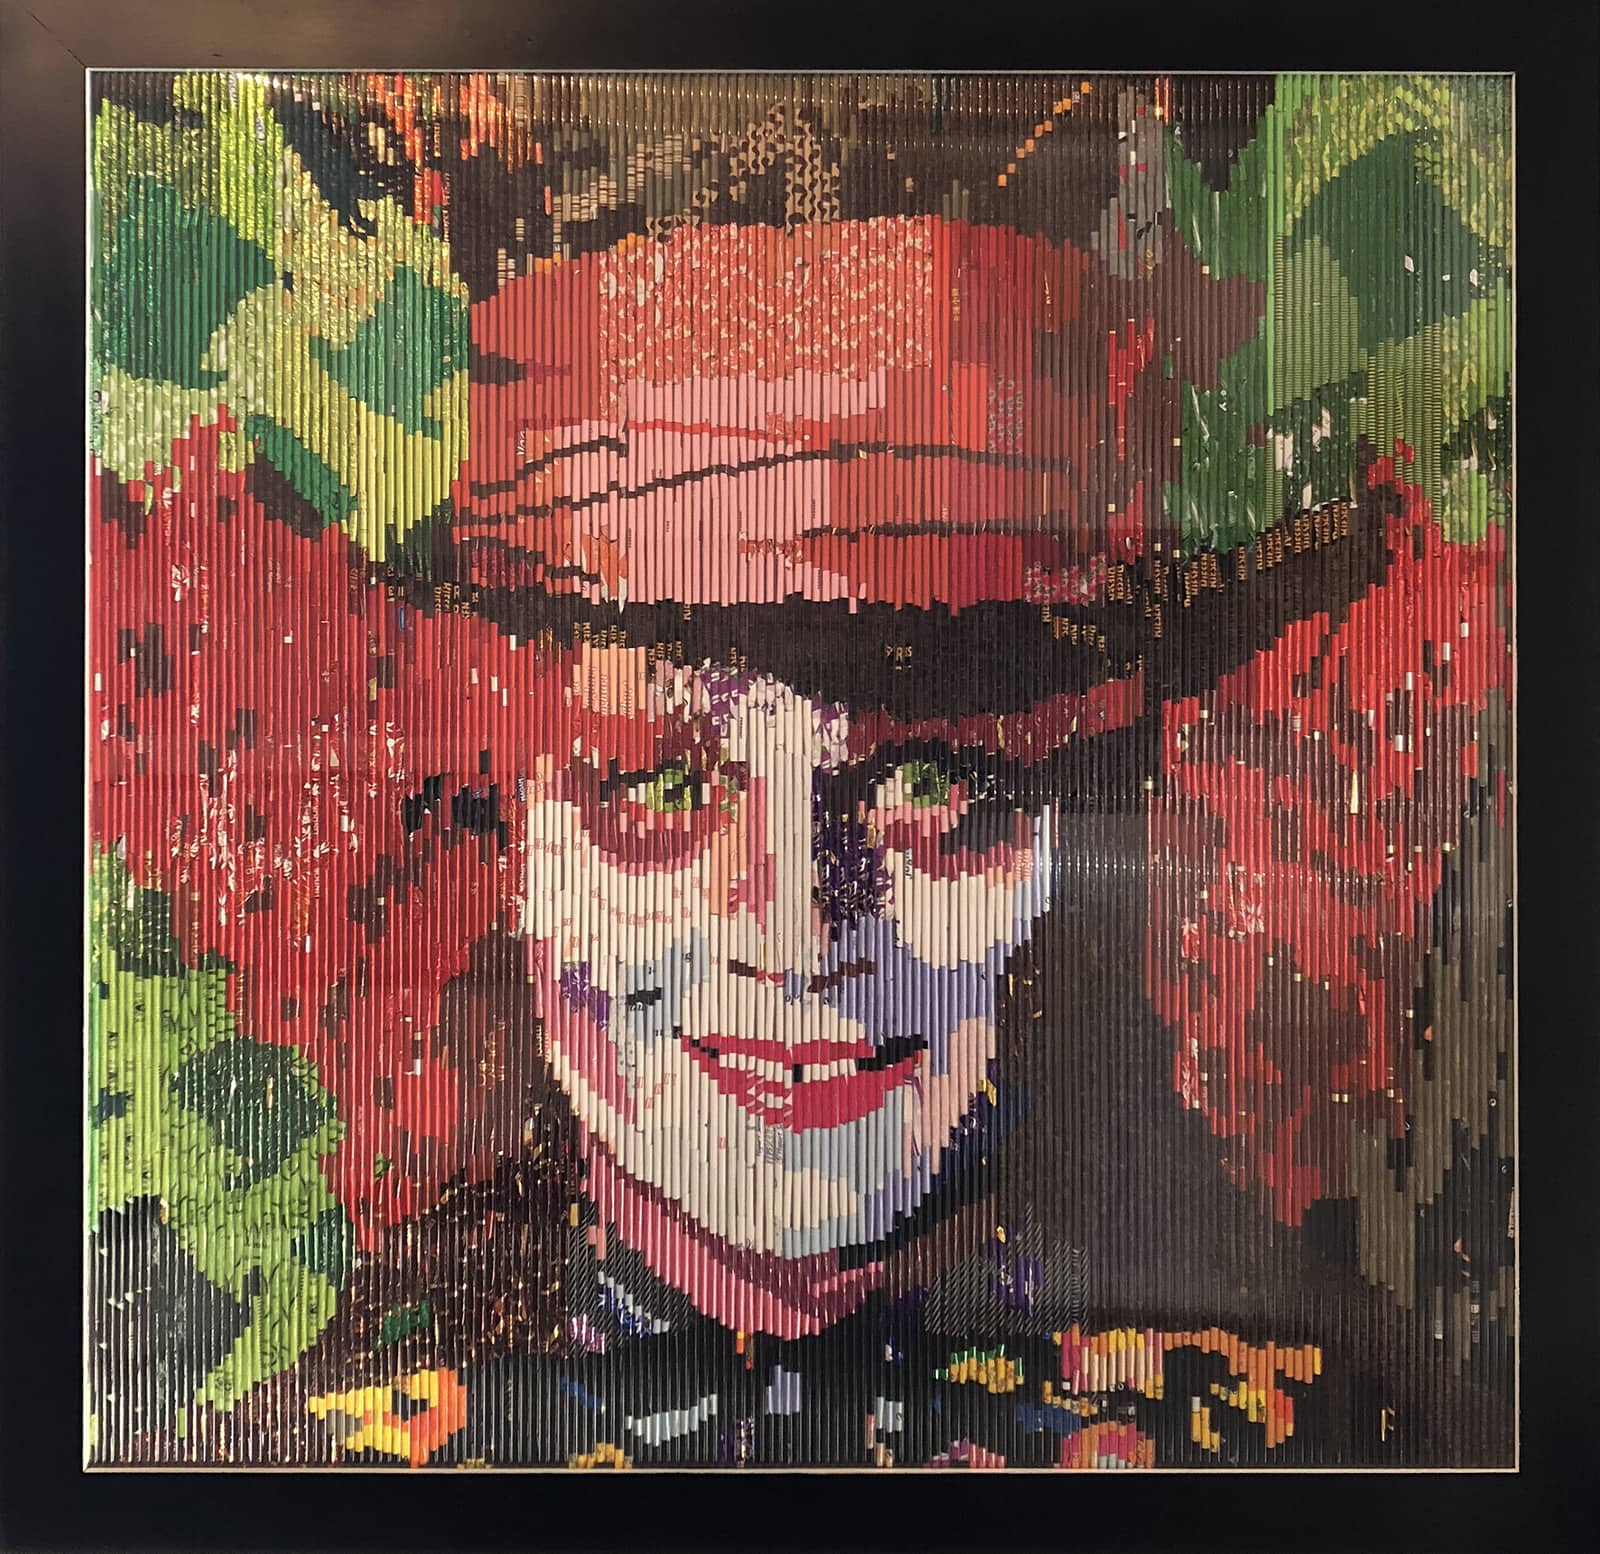 Mr. Hatter (J. Depp in Alice im Wunderland)